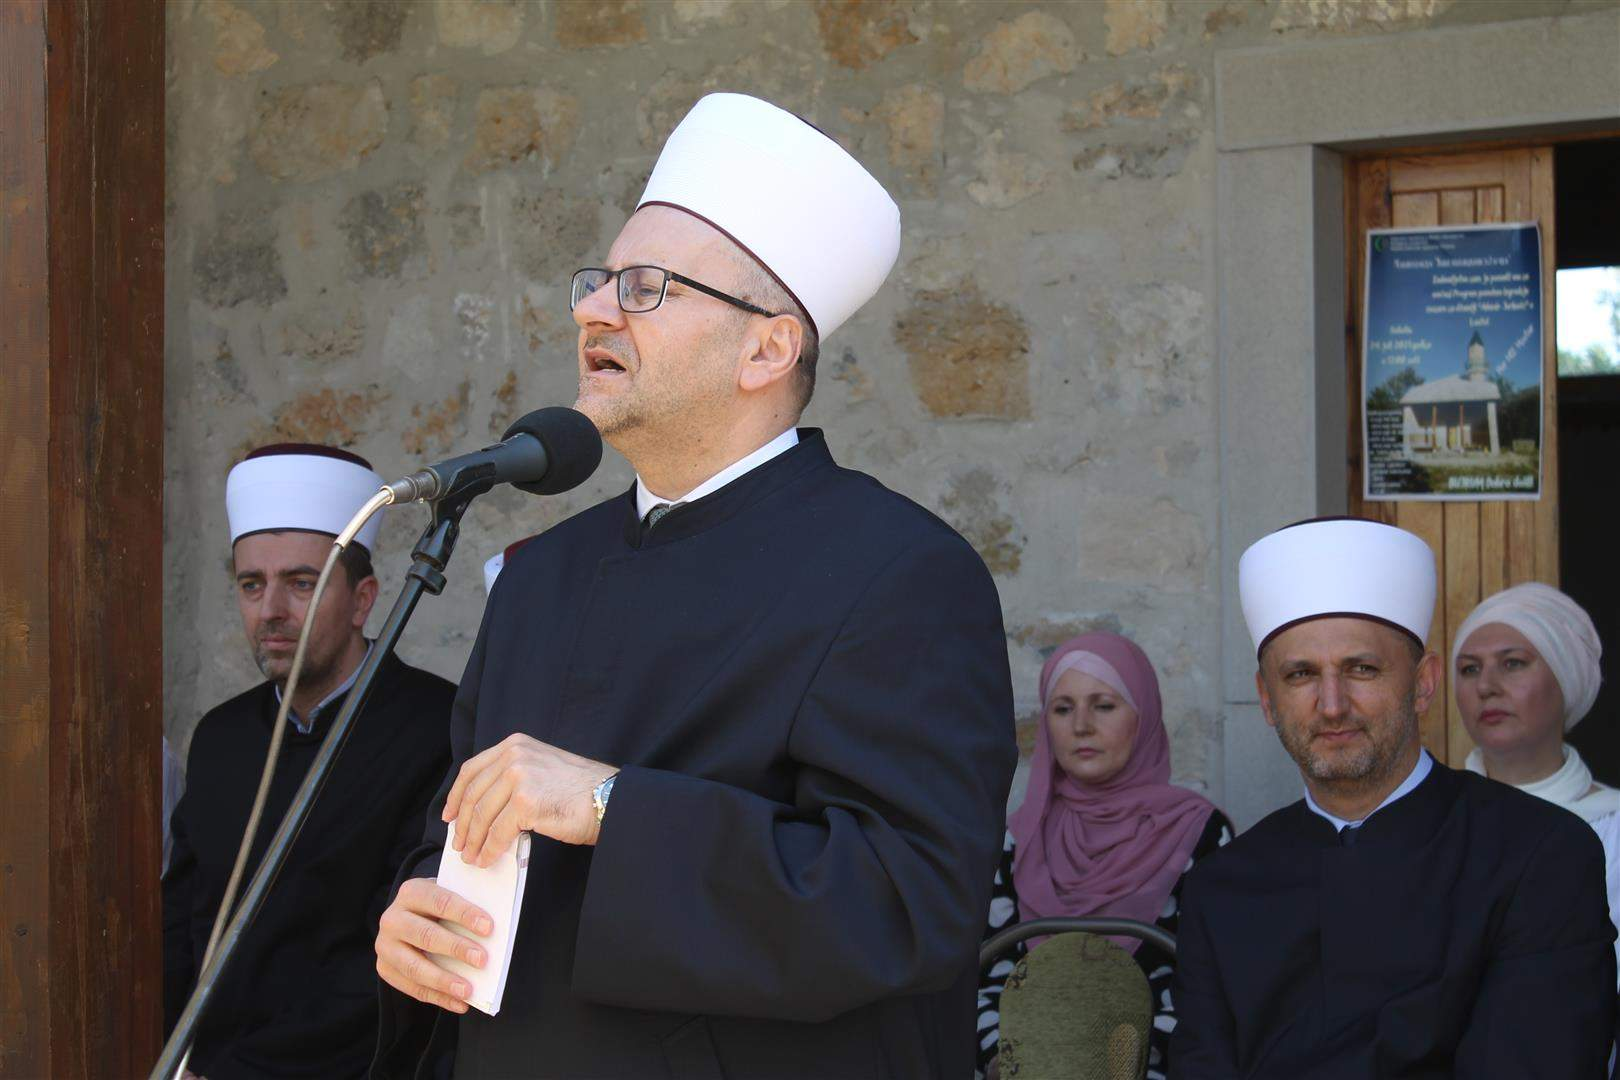 IMG_2596.JPG - Mevludskim programom obilježena izgradnja munare na džamiji